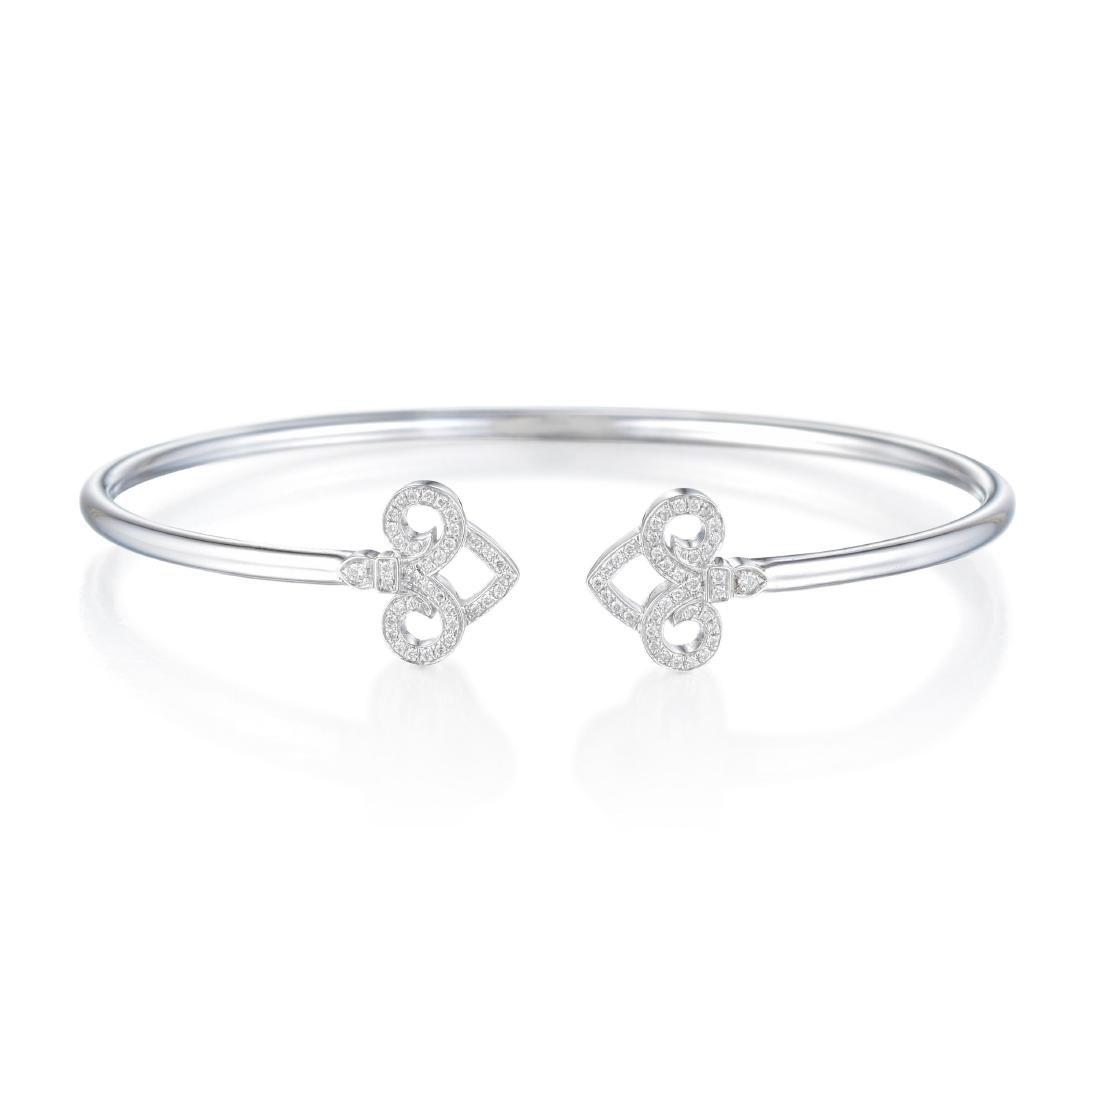 Tiffany & Co. Fleur de Lis Wire Bangle